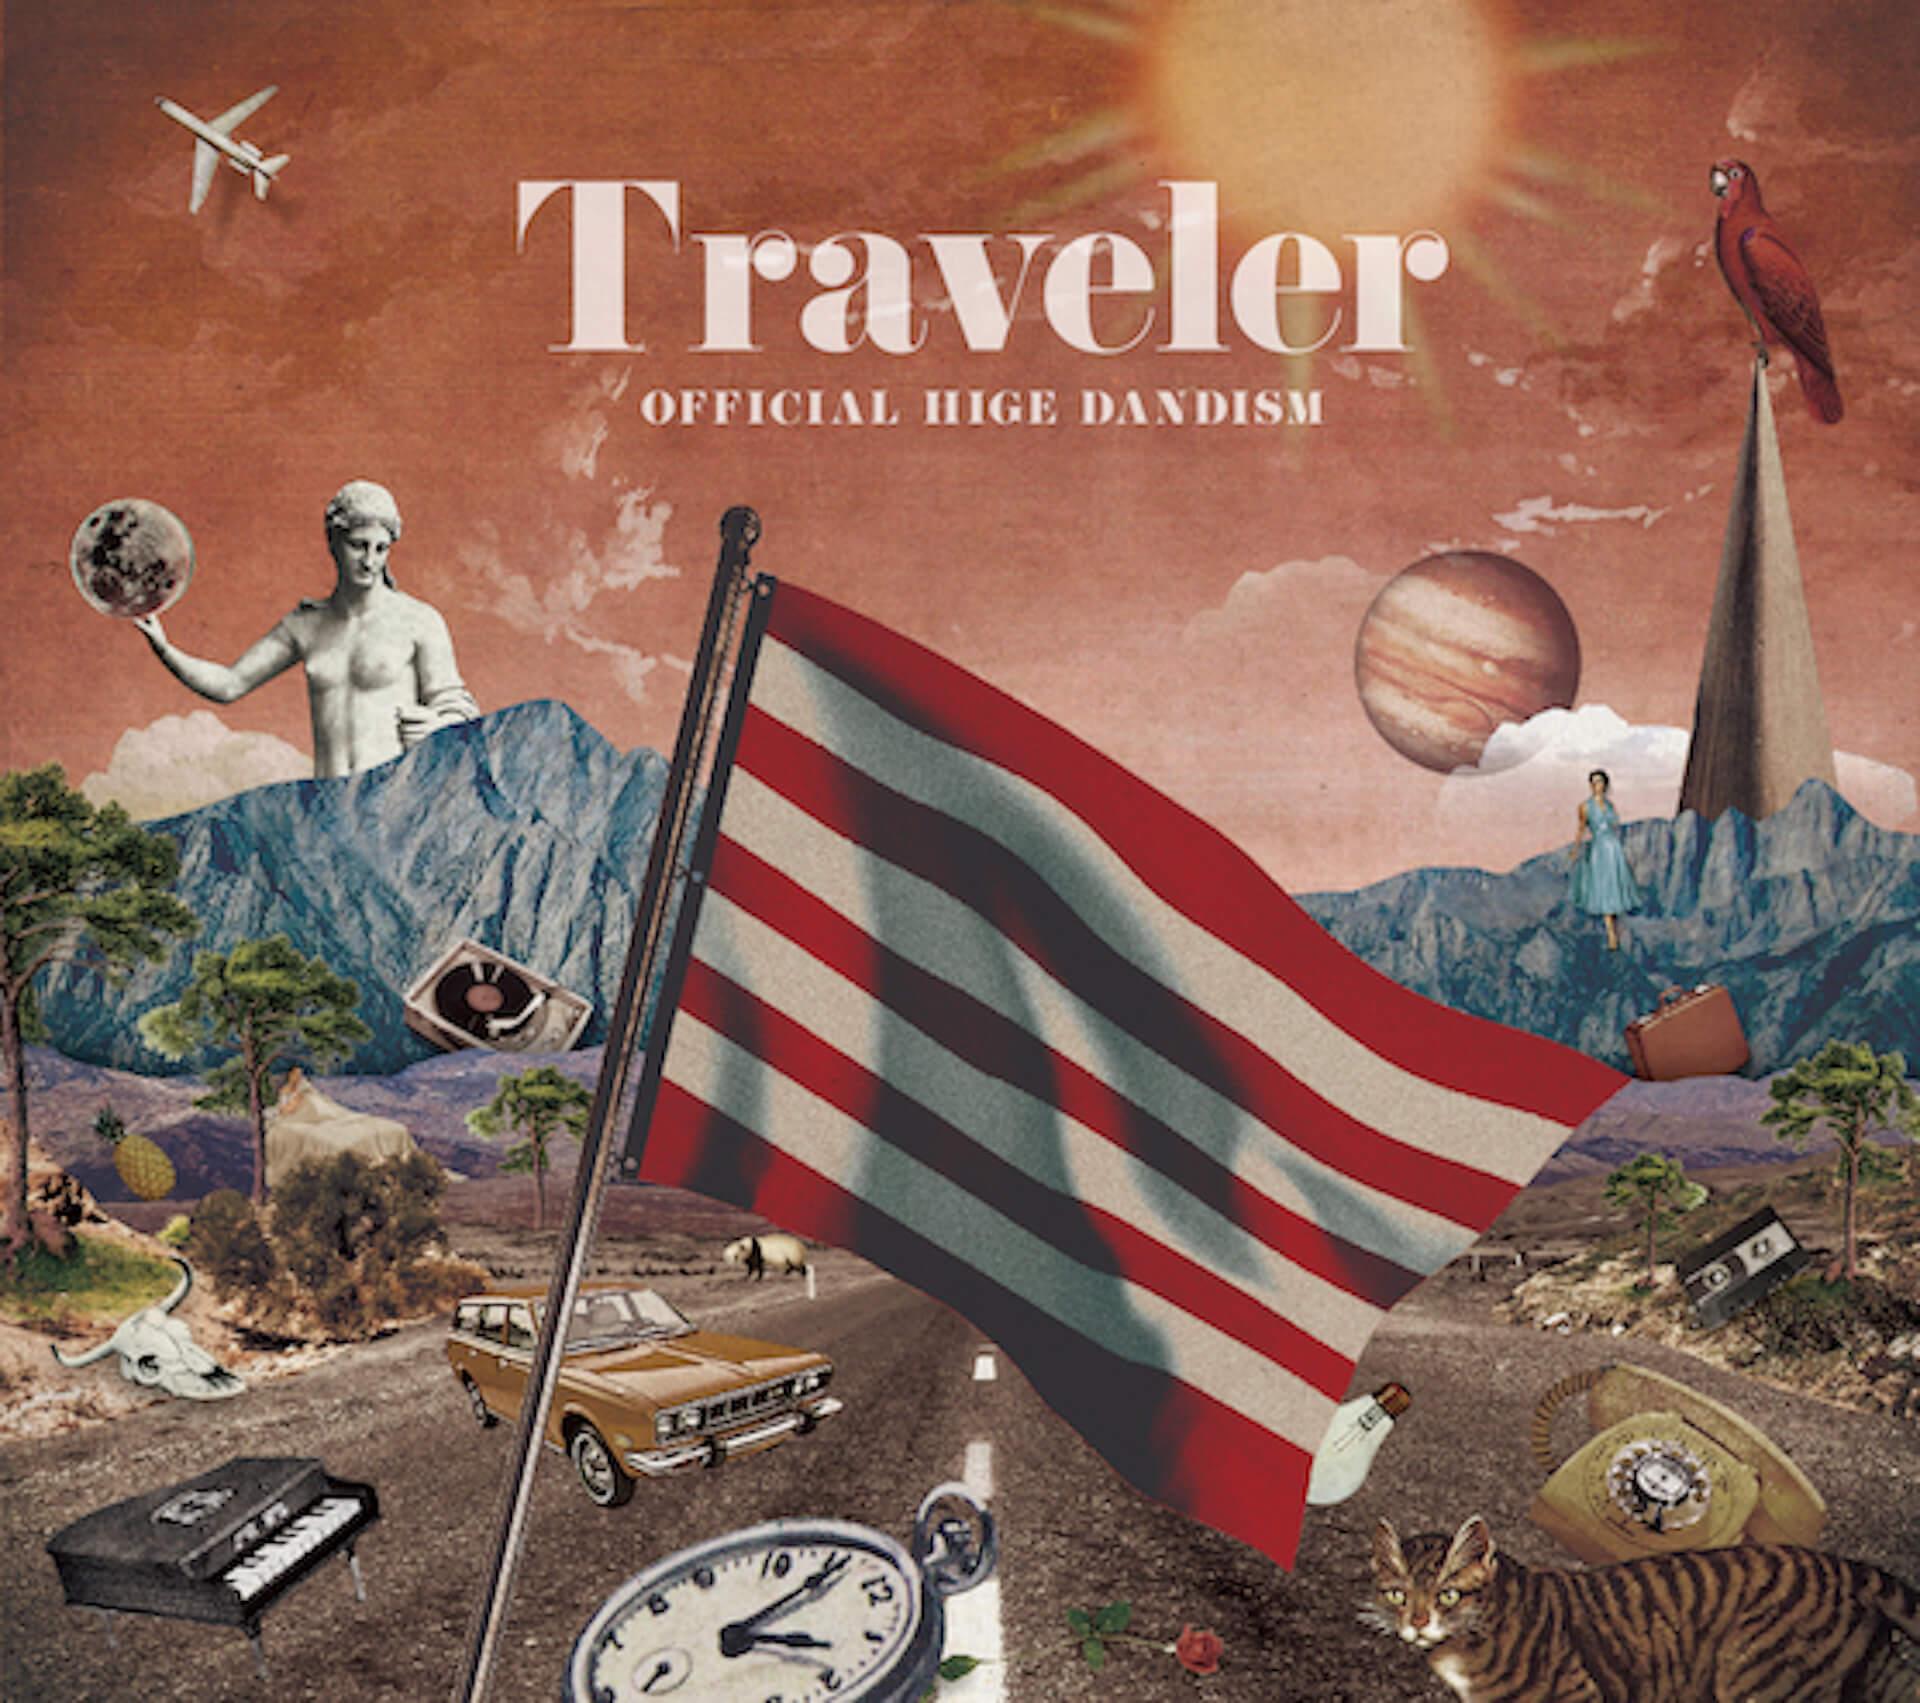 Official髭男dismが渋谷をジャック!『Traveler』発売記念、ジャックポスターが登場|渋谷某所で未発表曲の解禁も music191007_higedan_5